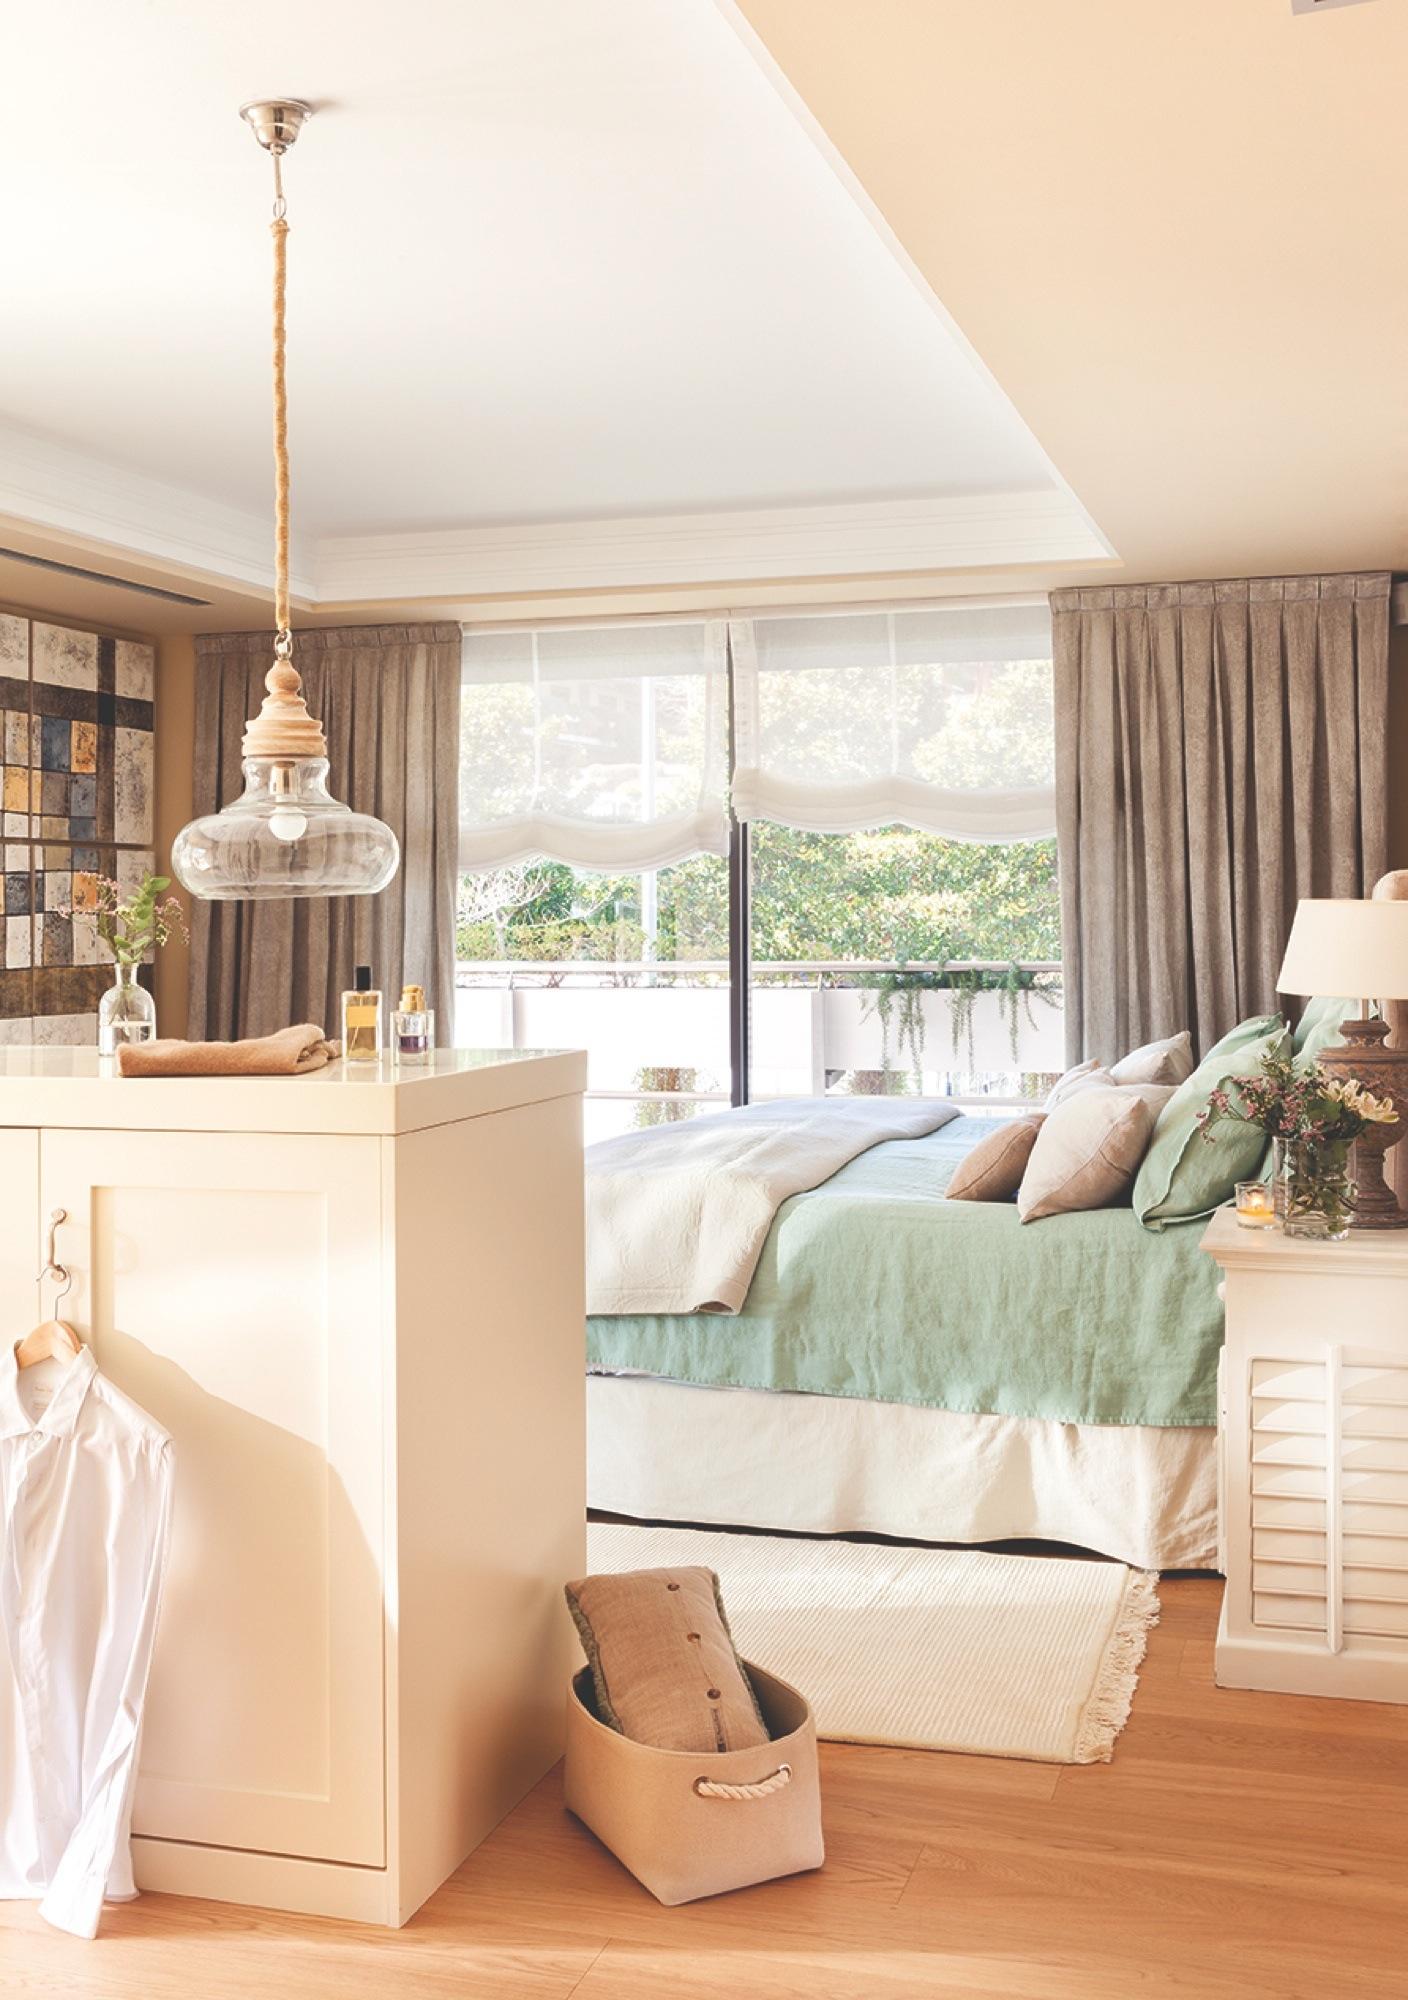 20 dormitorios con muchas ideas for Modelo de dormitorio 2016